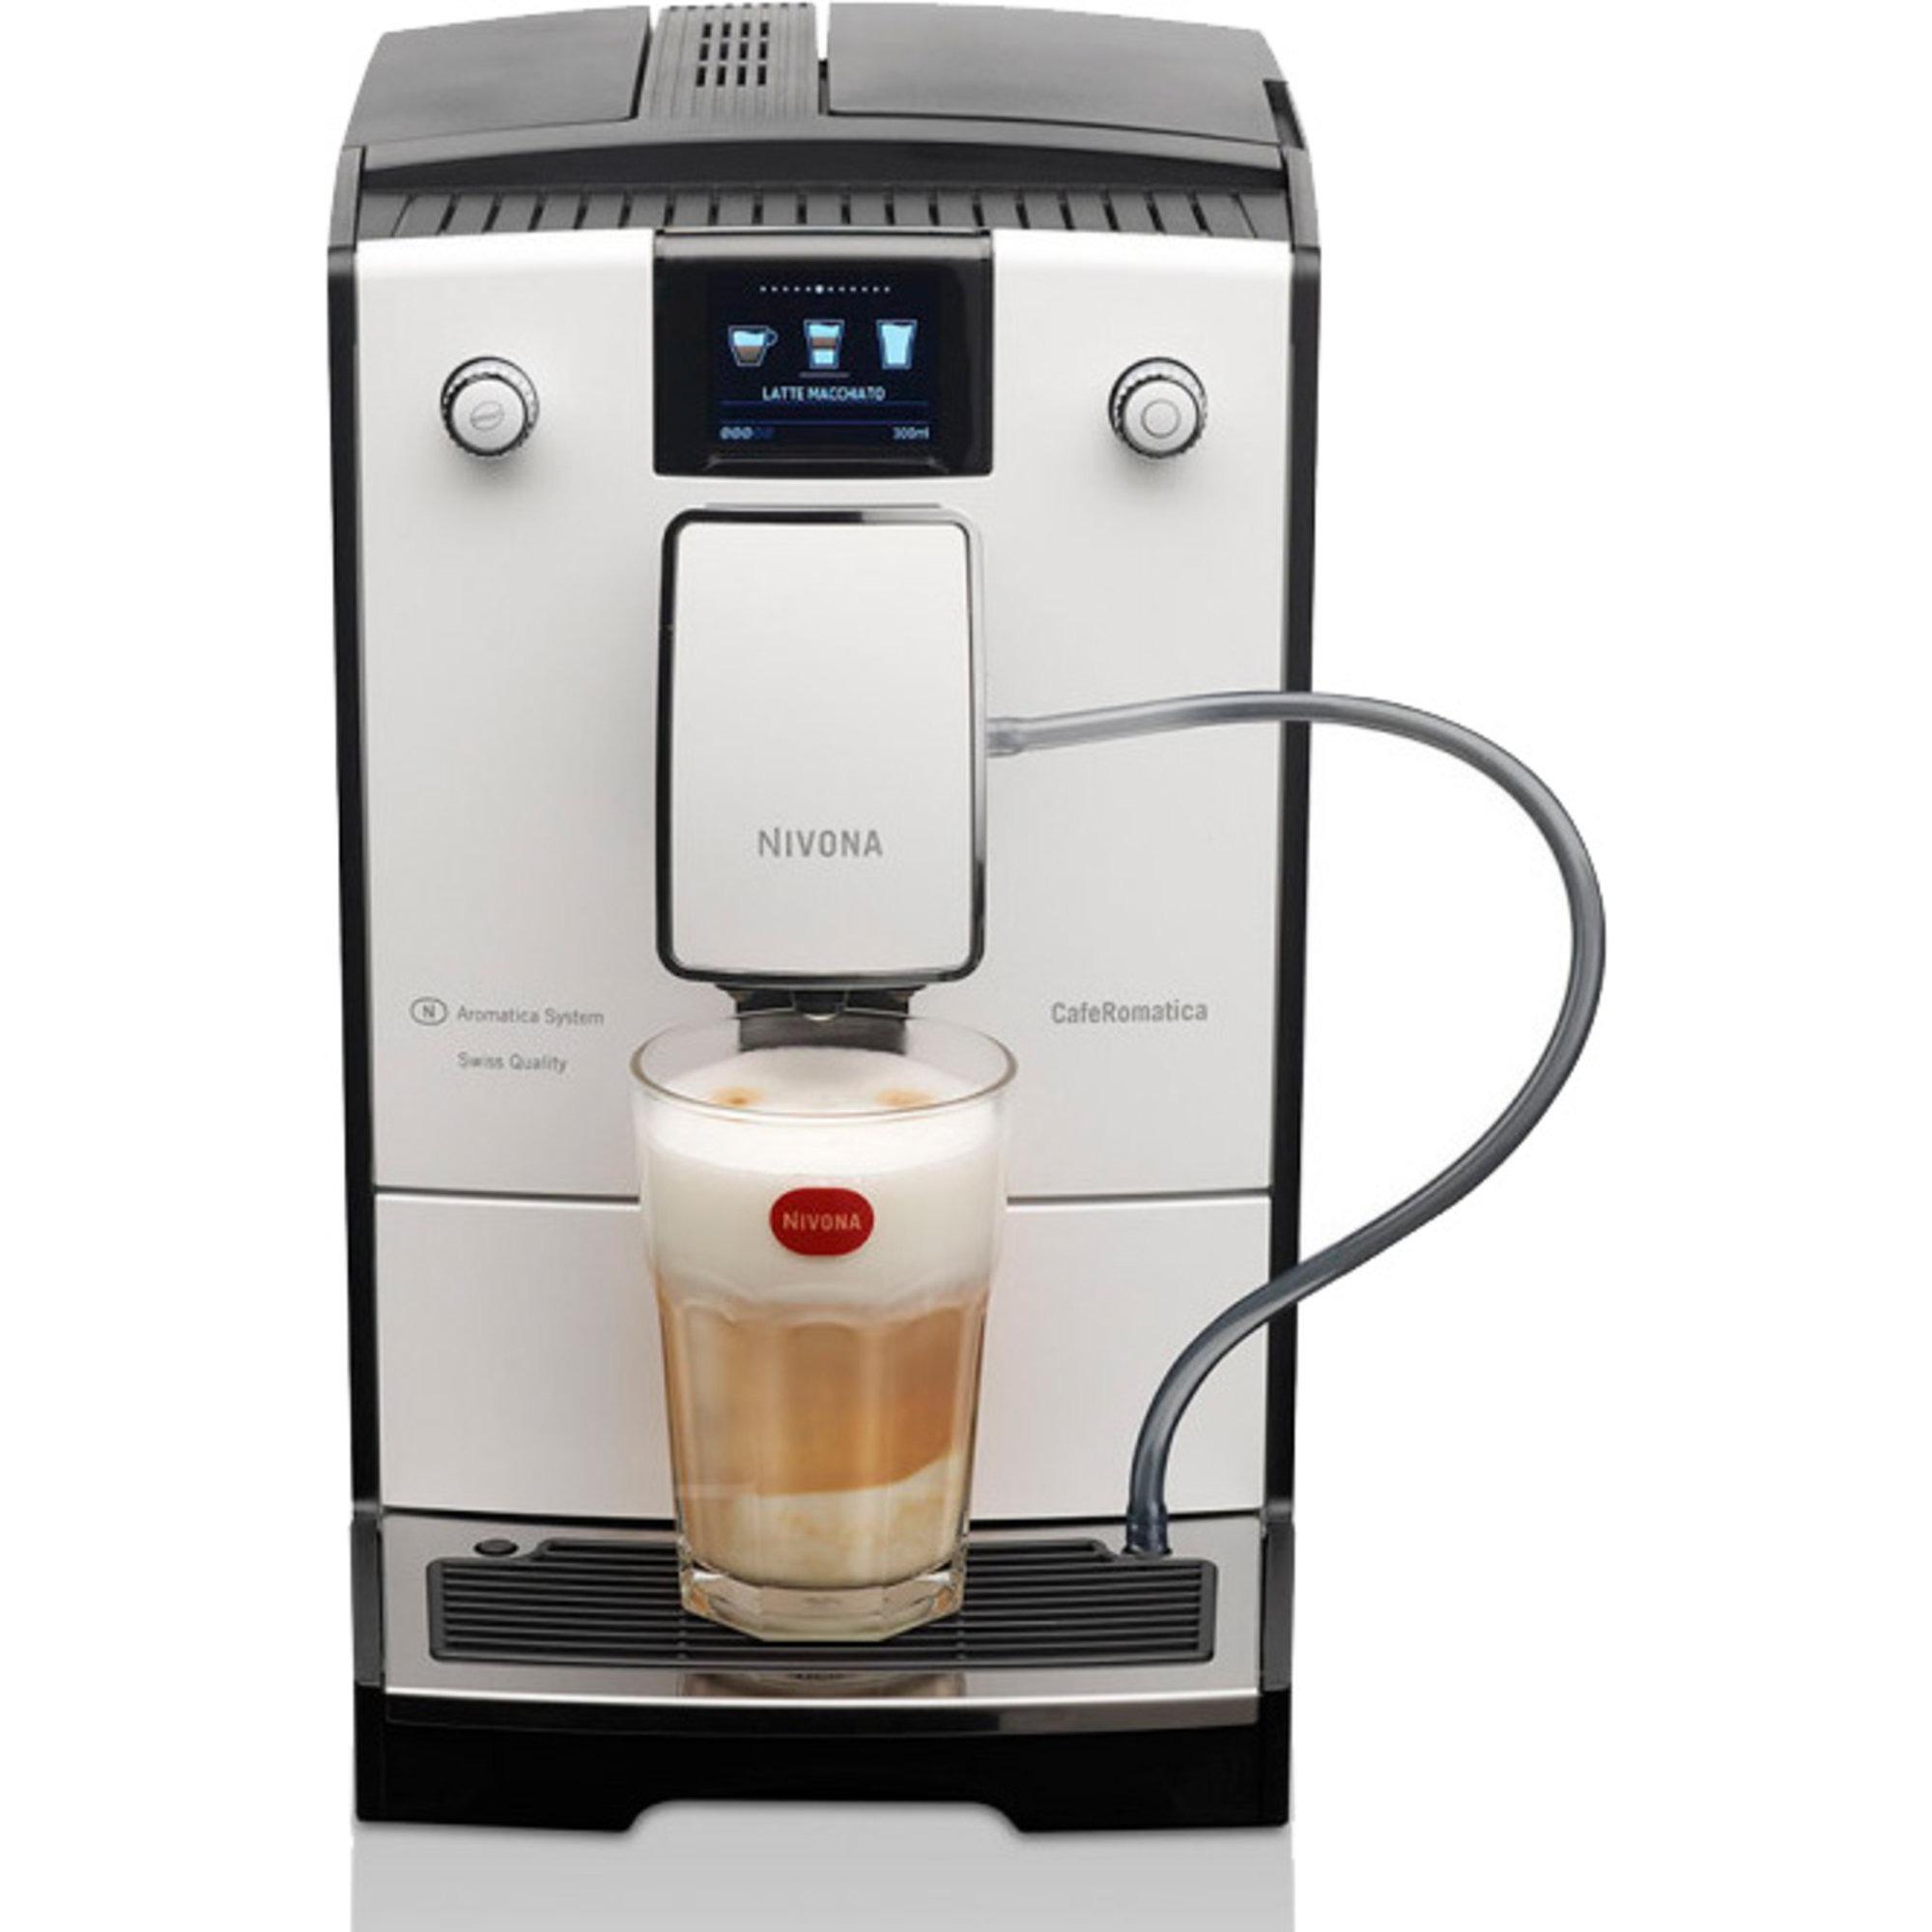 Nivona Caferomatica & NICR kaffemaskiner   Kungligt Kaffe